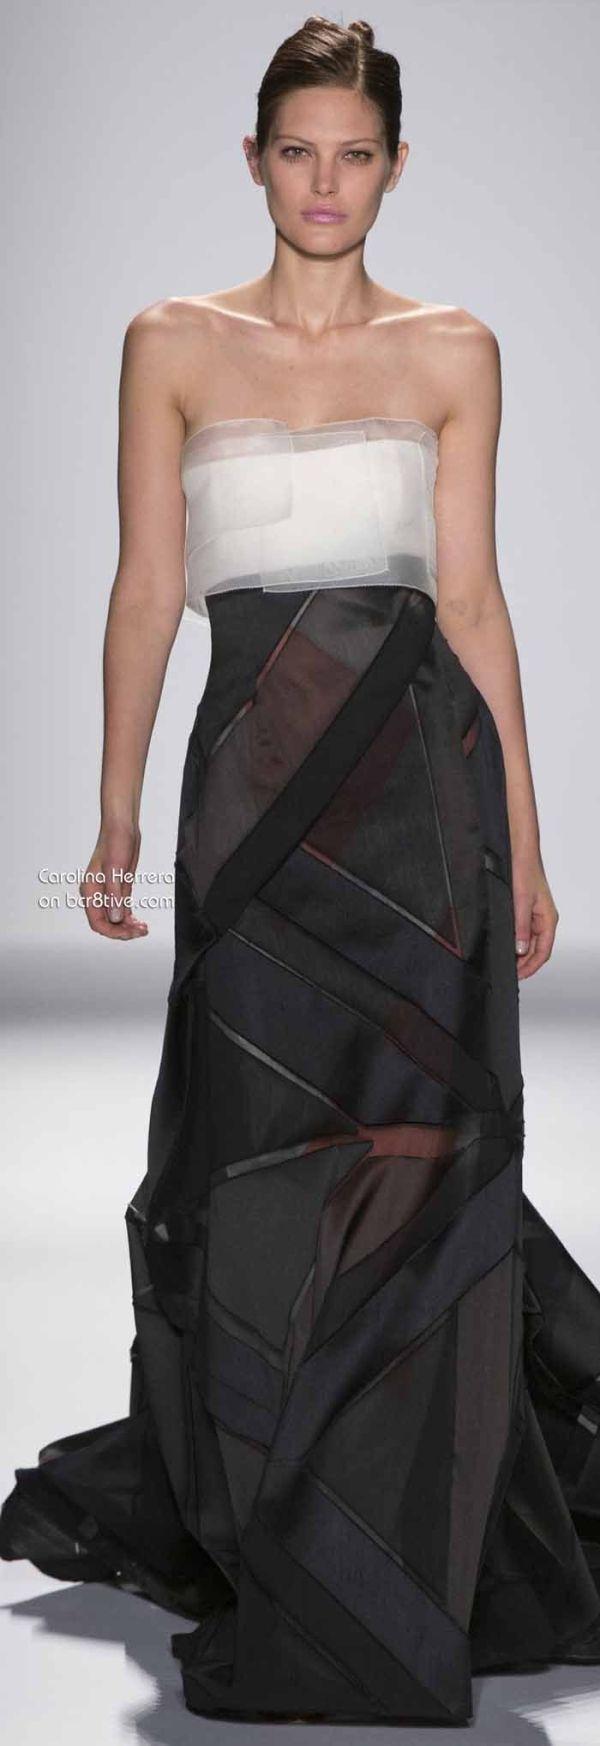 Carolina Herrera, 2014 - Dress - Haute Couture / Vestido #Noche #AltaCostura